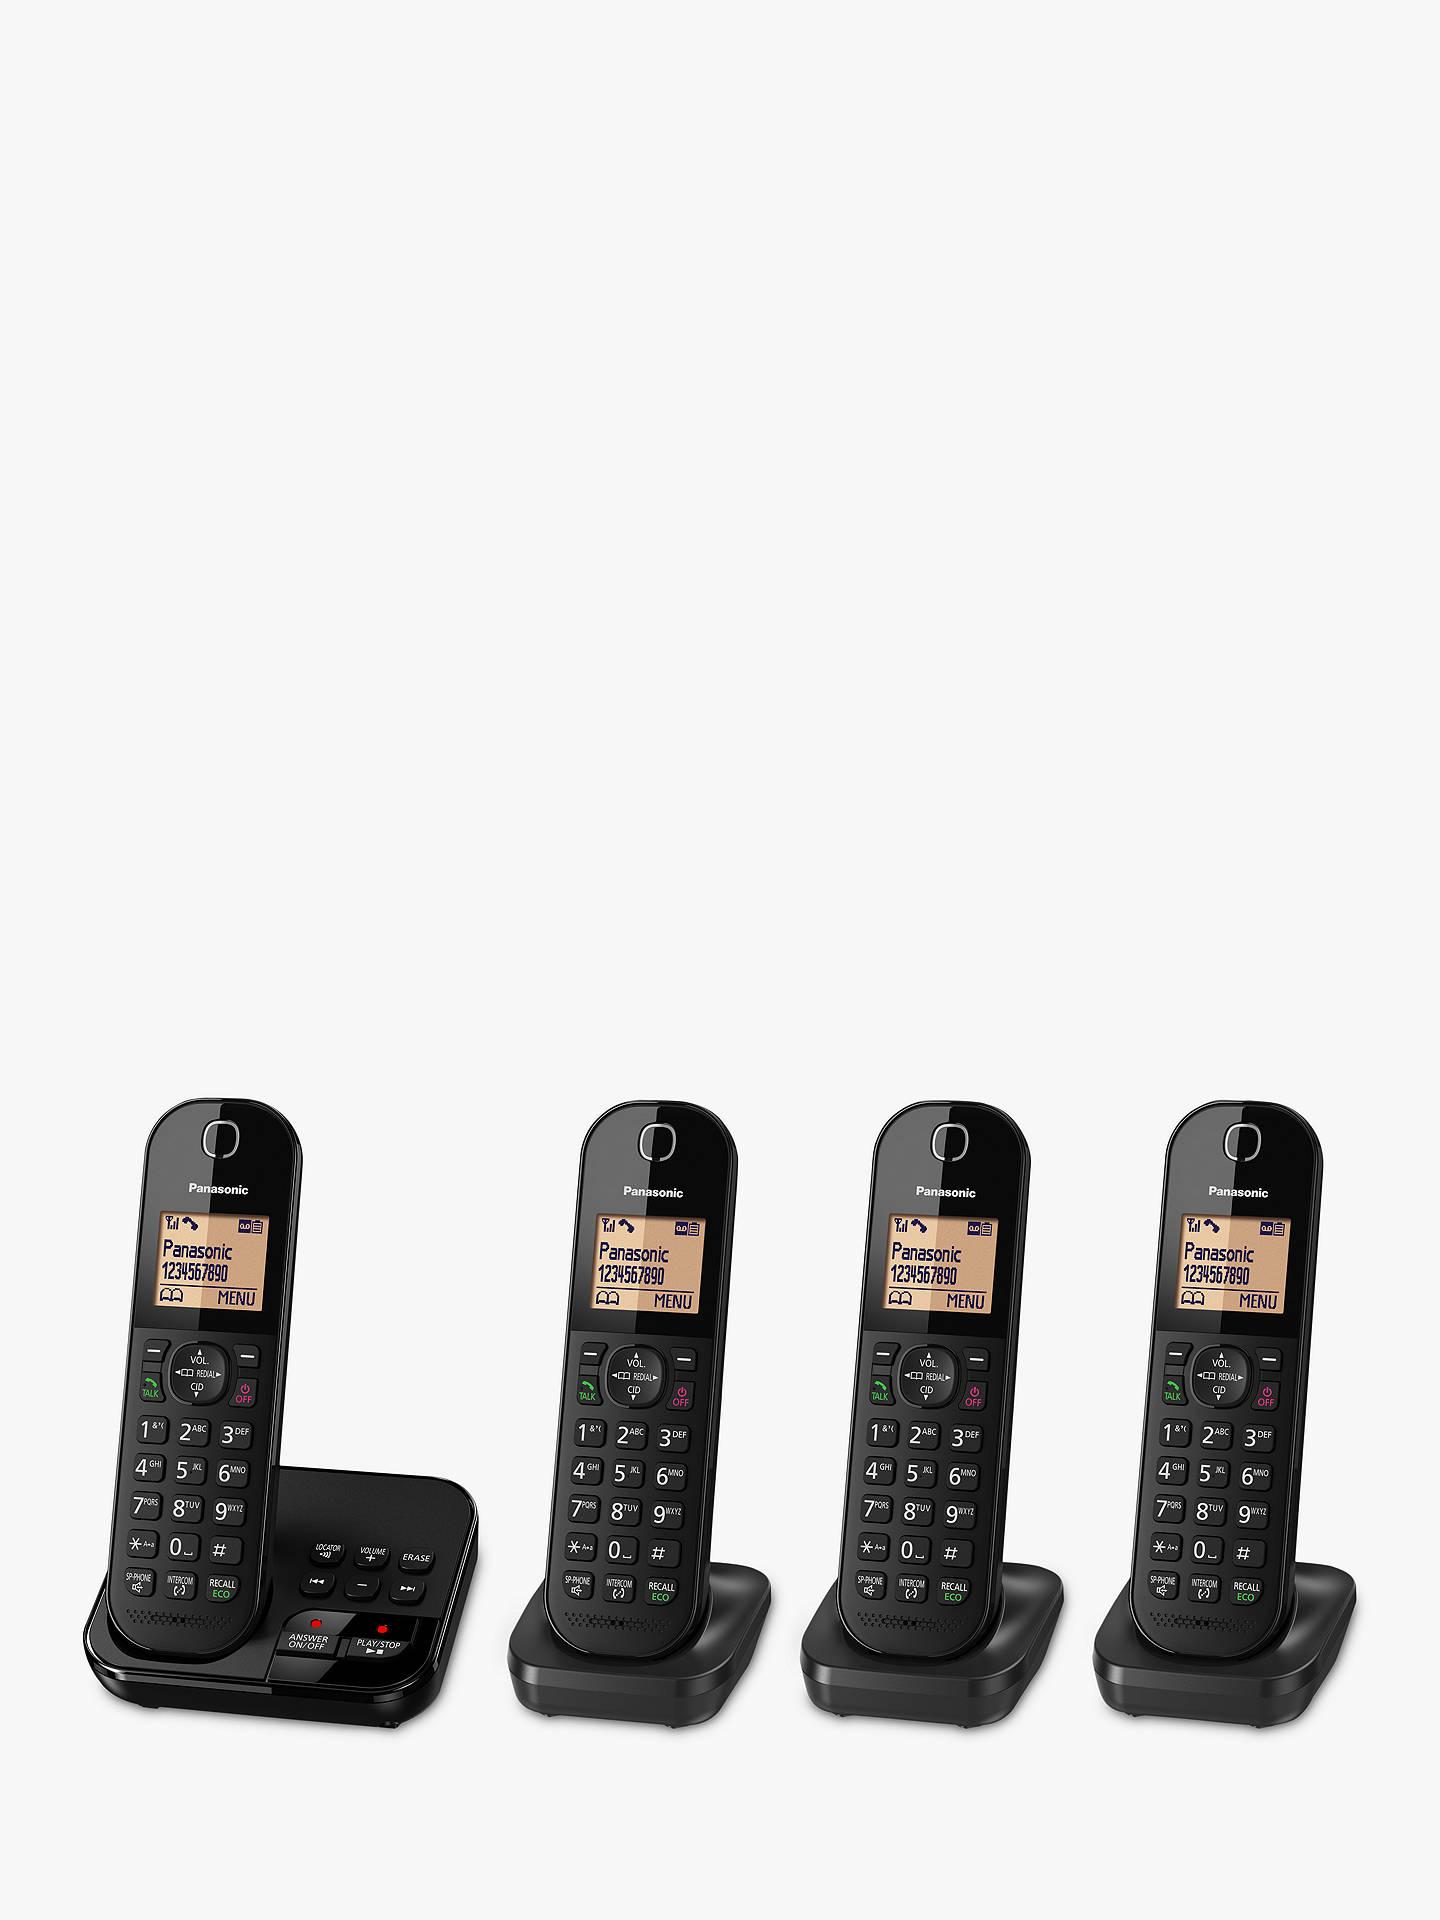 21ed9d70f0d Buy Panasonic KX-TGC424EB Digital Cordless Telephone with 1.6